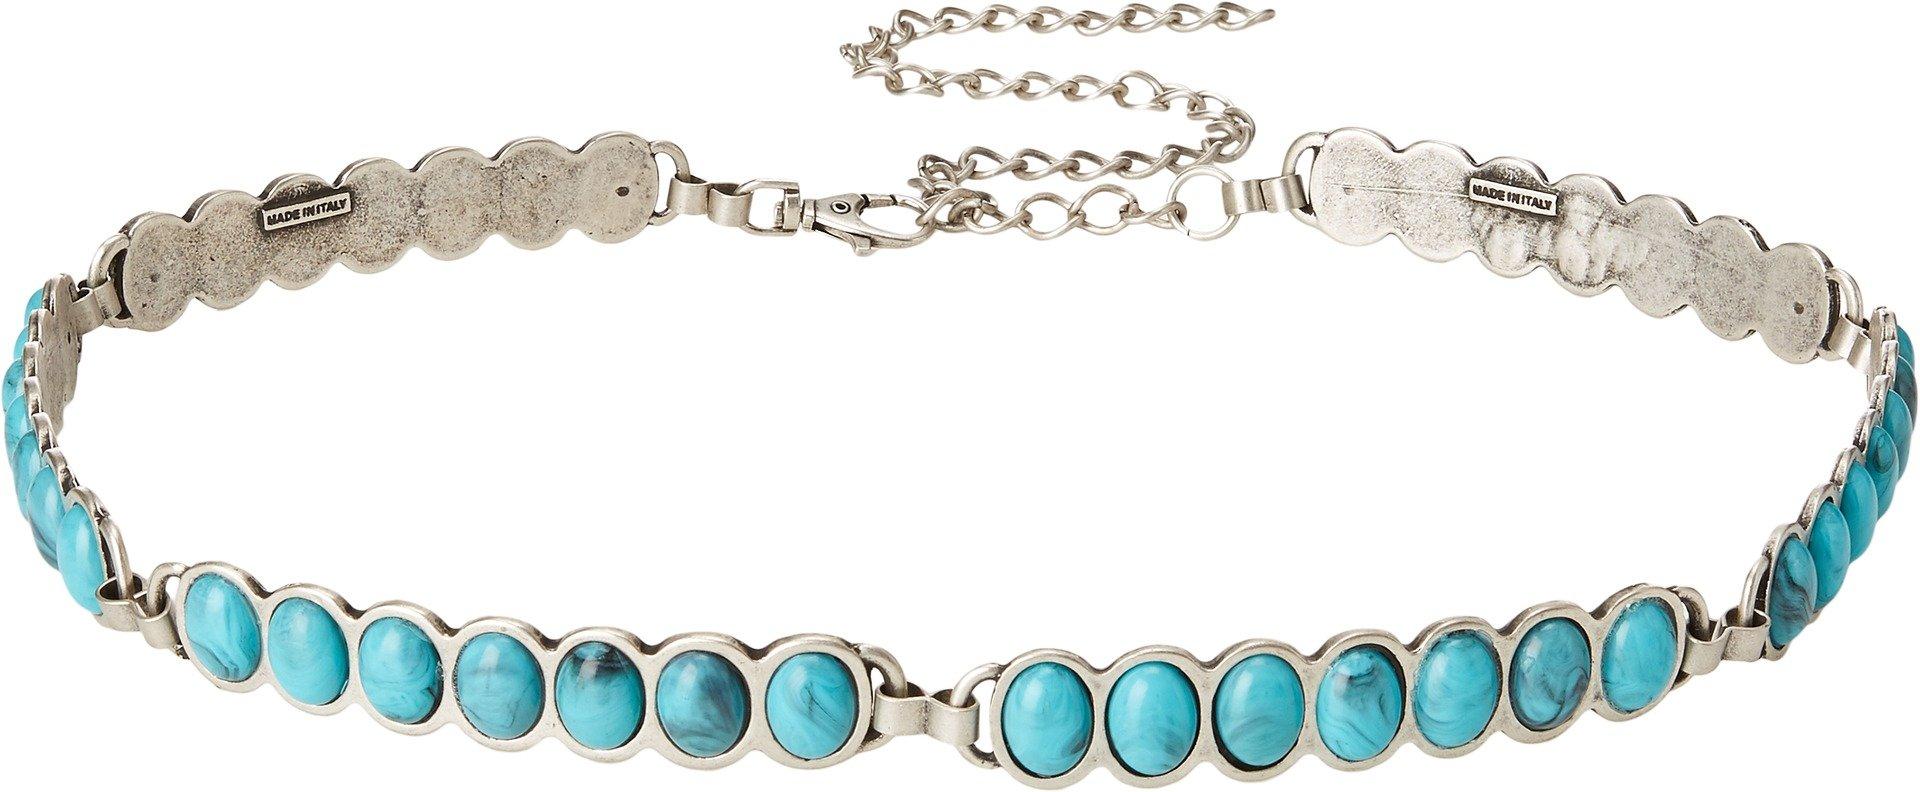 Amsterdam Heritage Women's 15503 Silver/Turquoise Belt